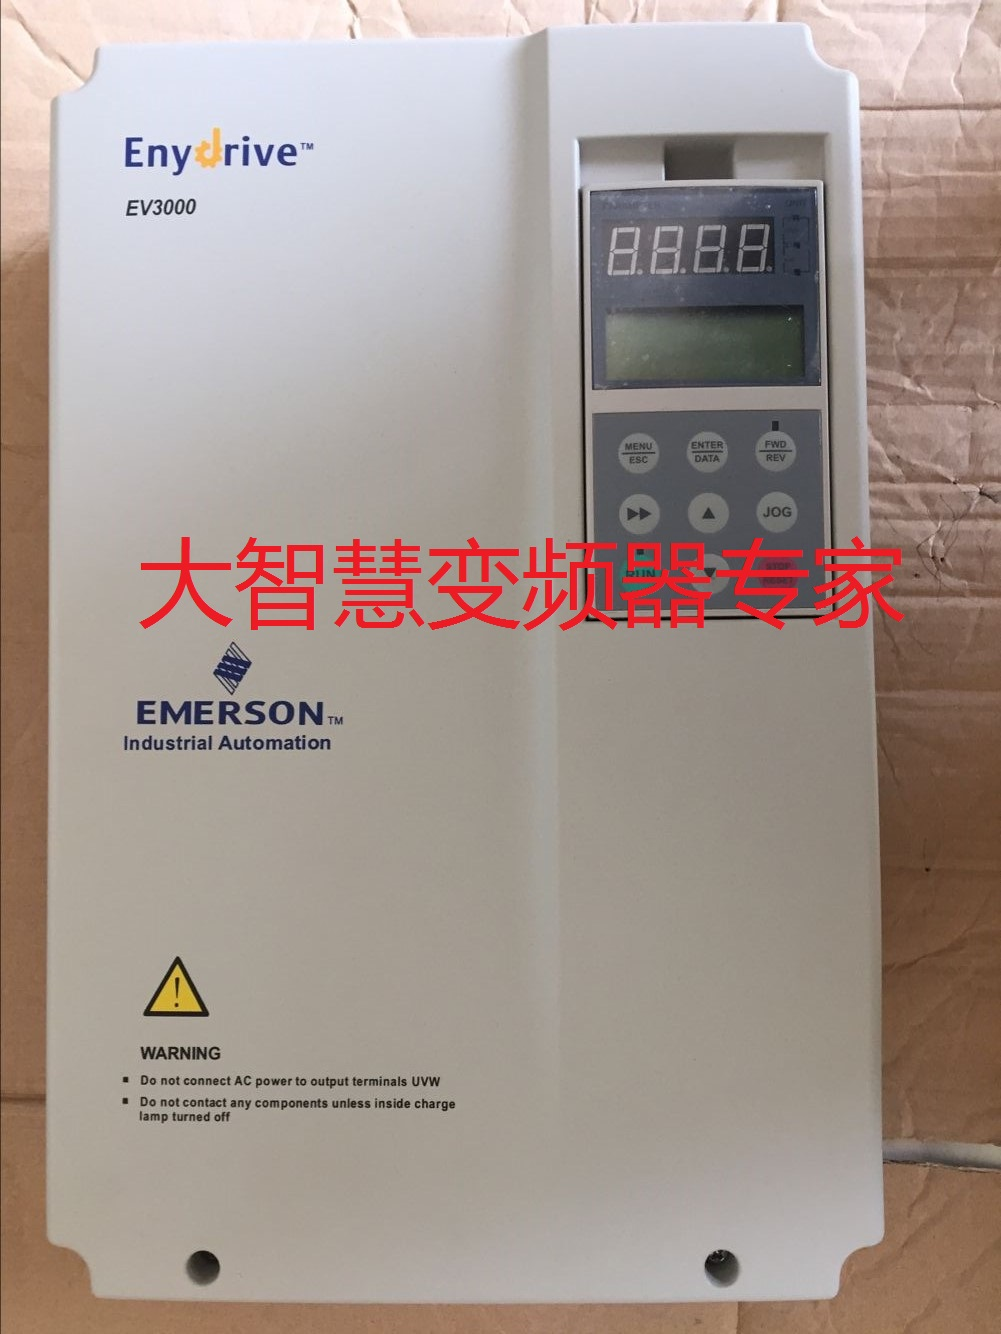 EV3000-4T0110G/TD3000-4T0110G/TD3300-4T0110G Эмерсон инвертор